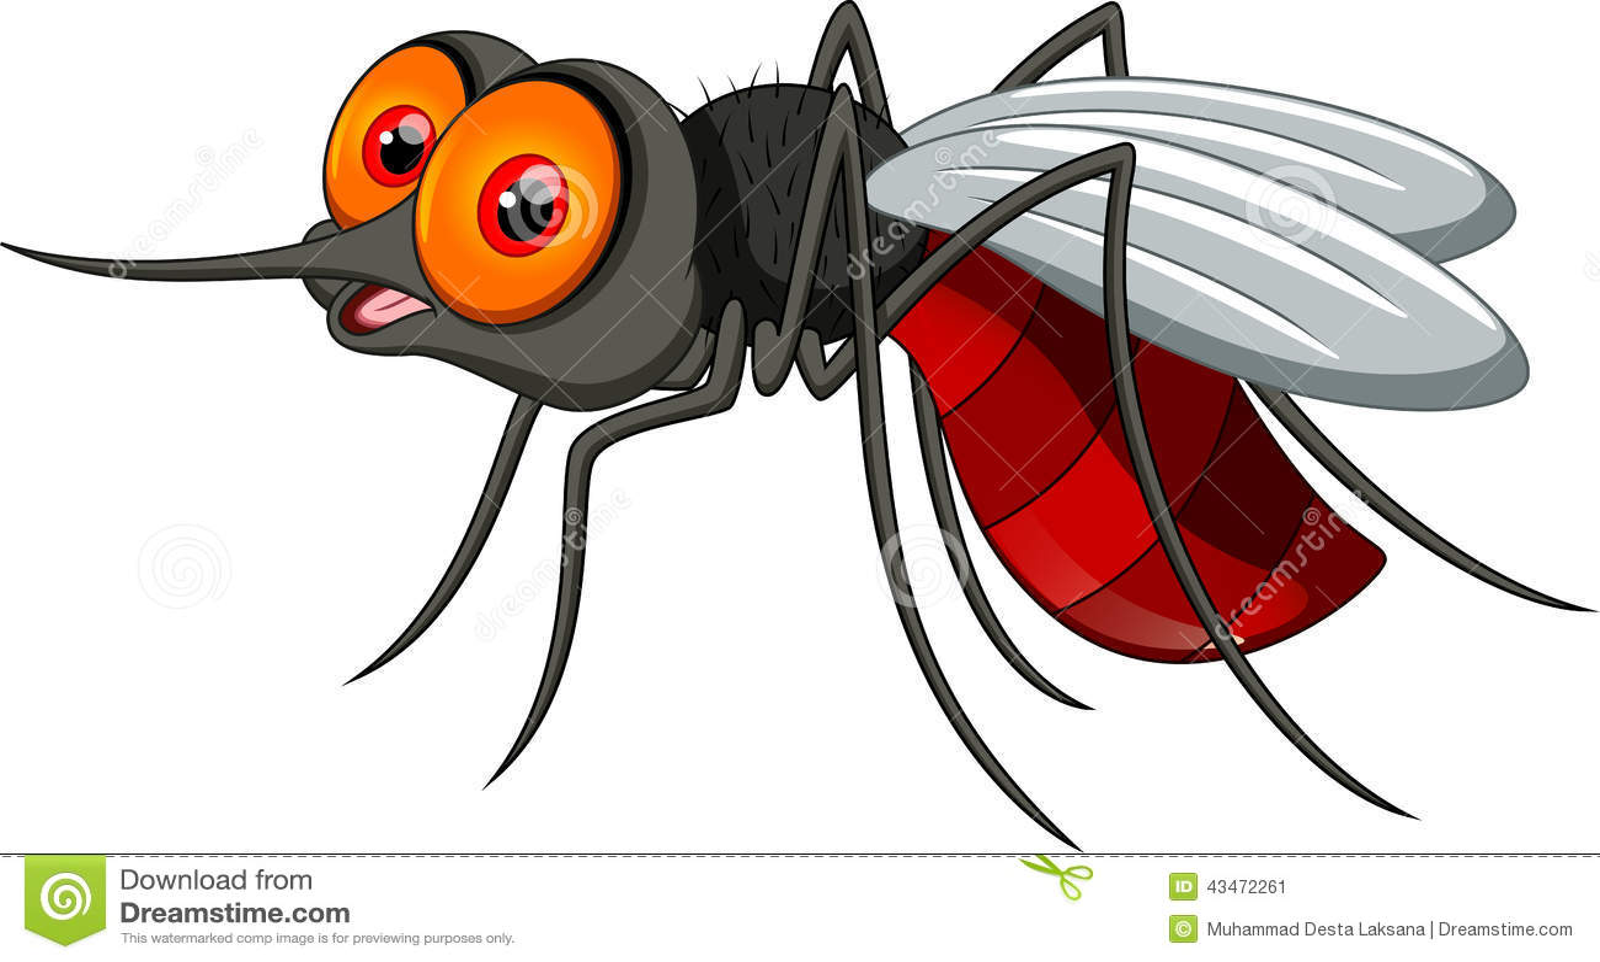 Cute Mosquito Cartoon Stock Illustration - Image: 43472261